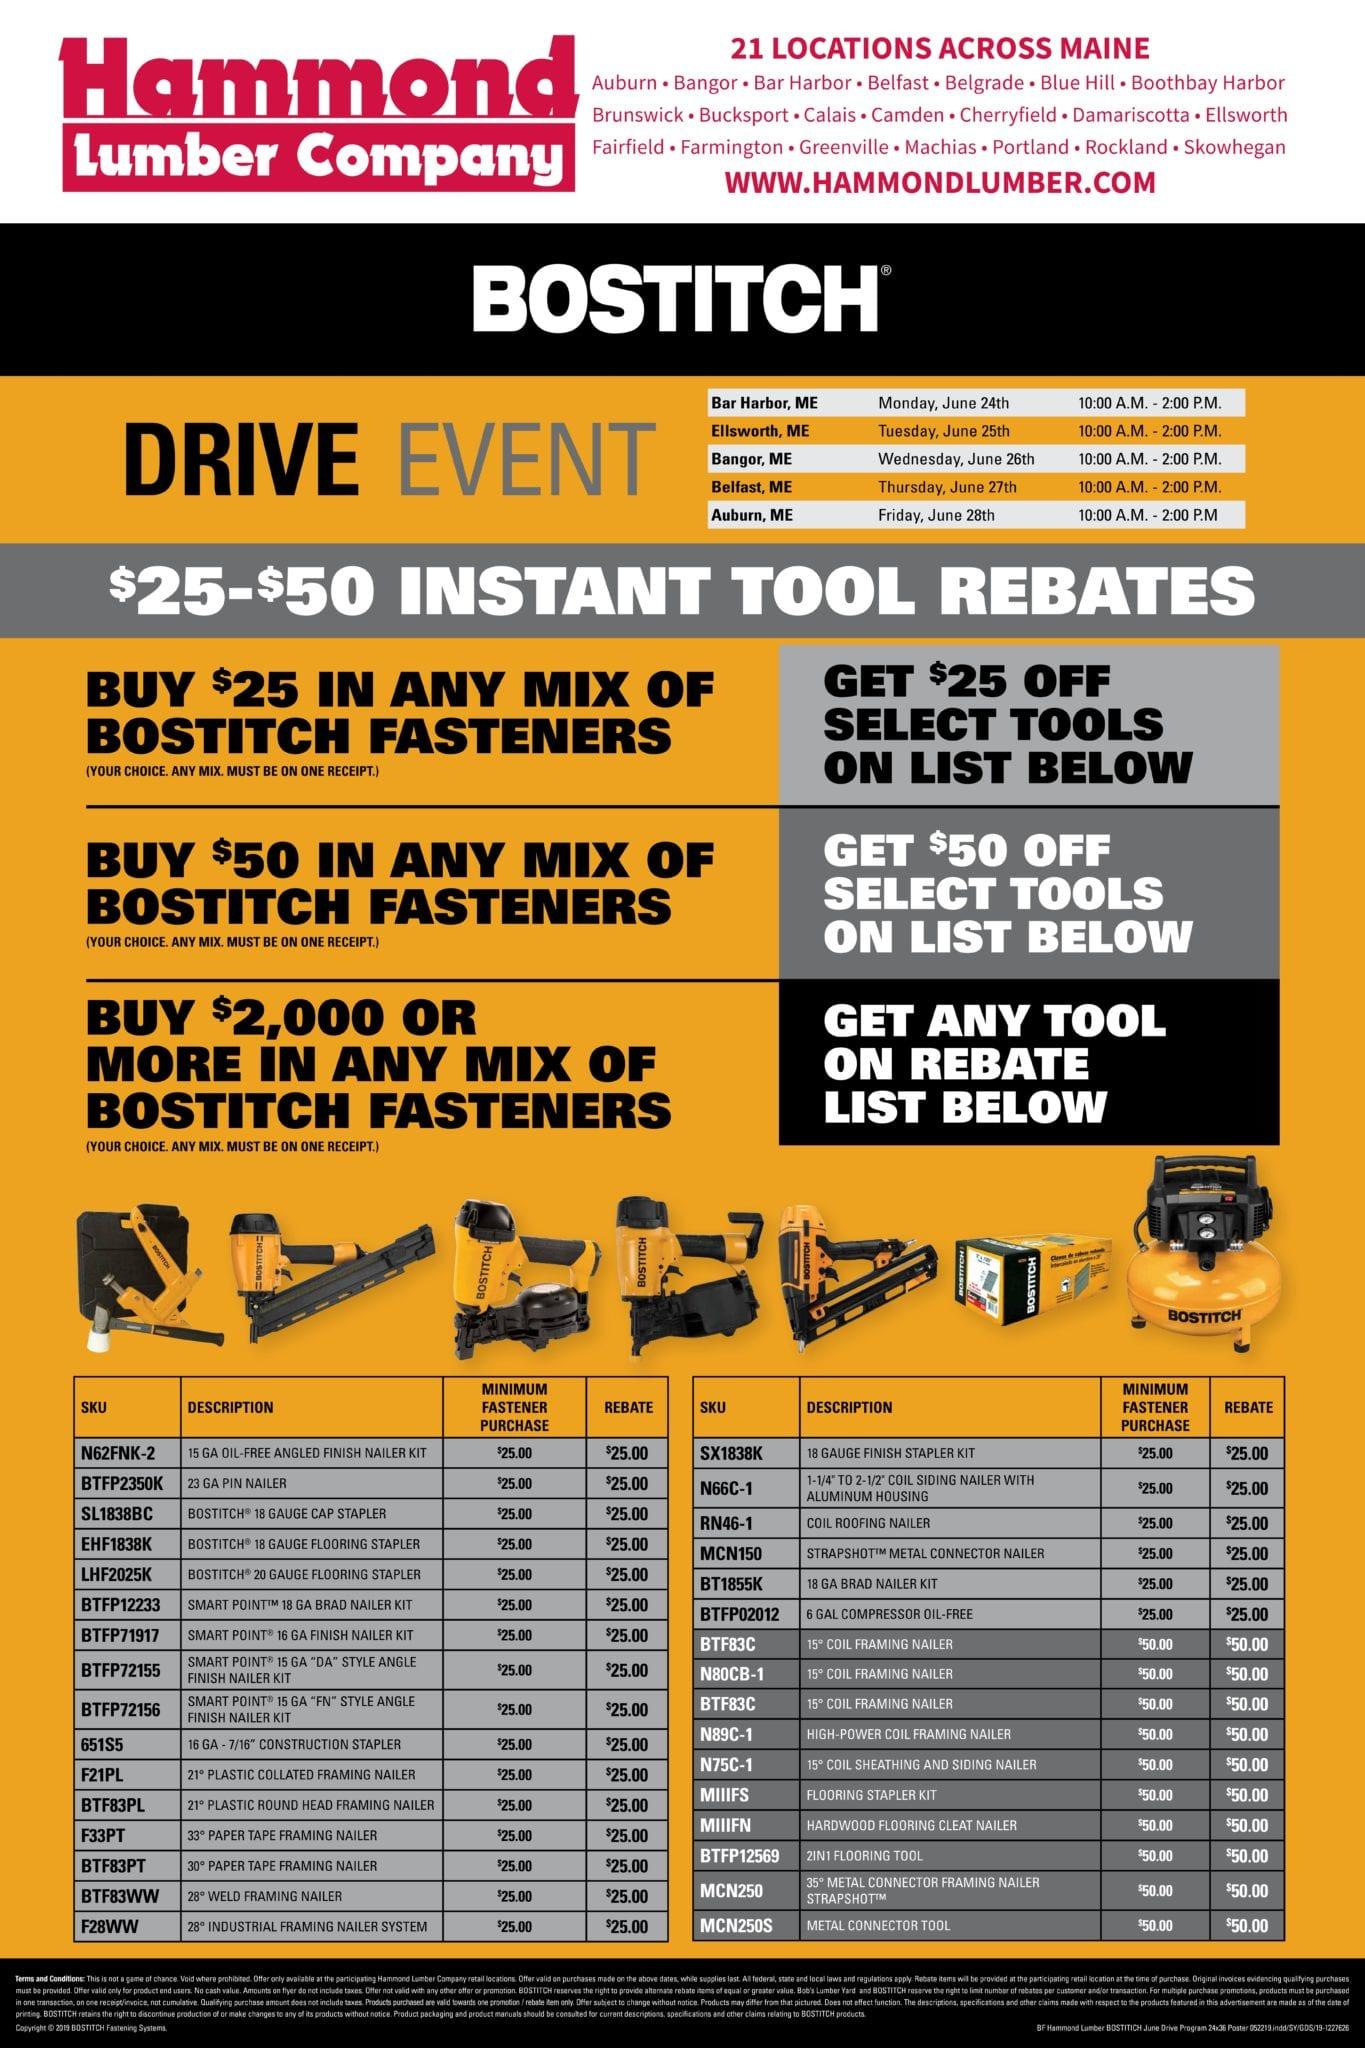 Bostitch Tool Drive Event Hammond Lumber Company